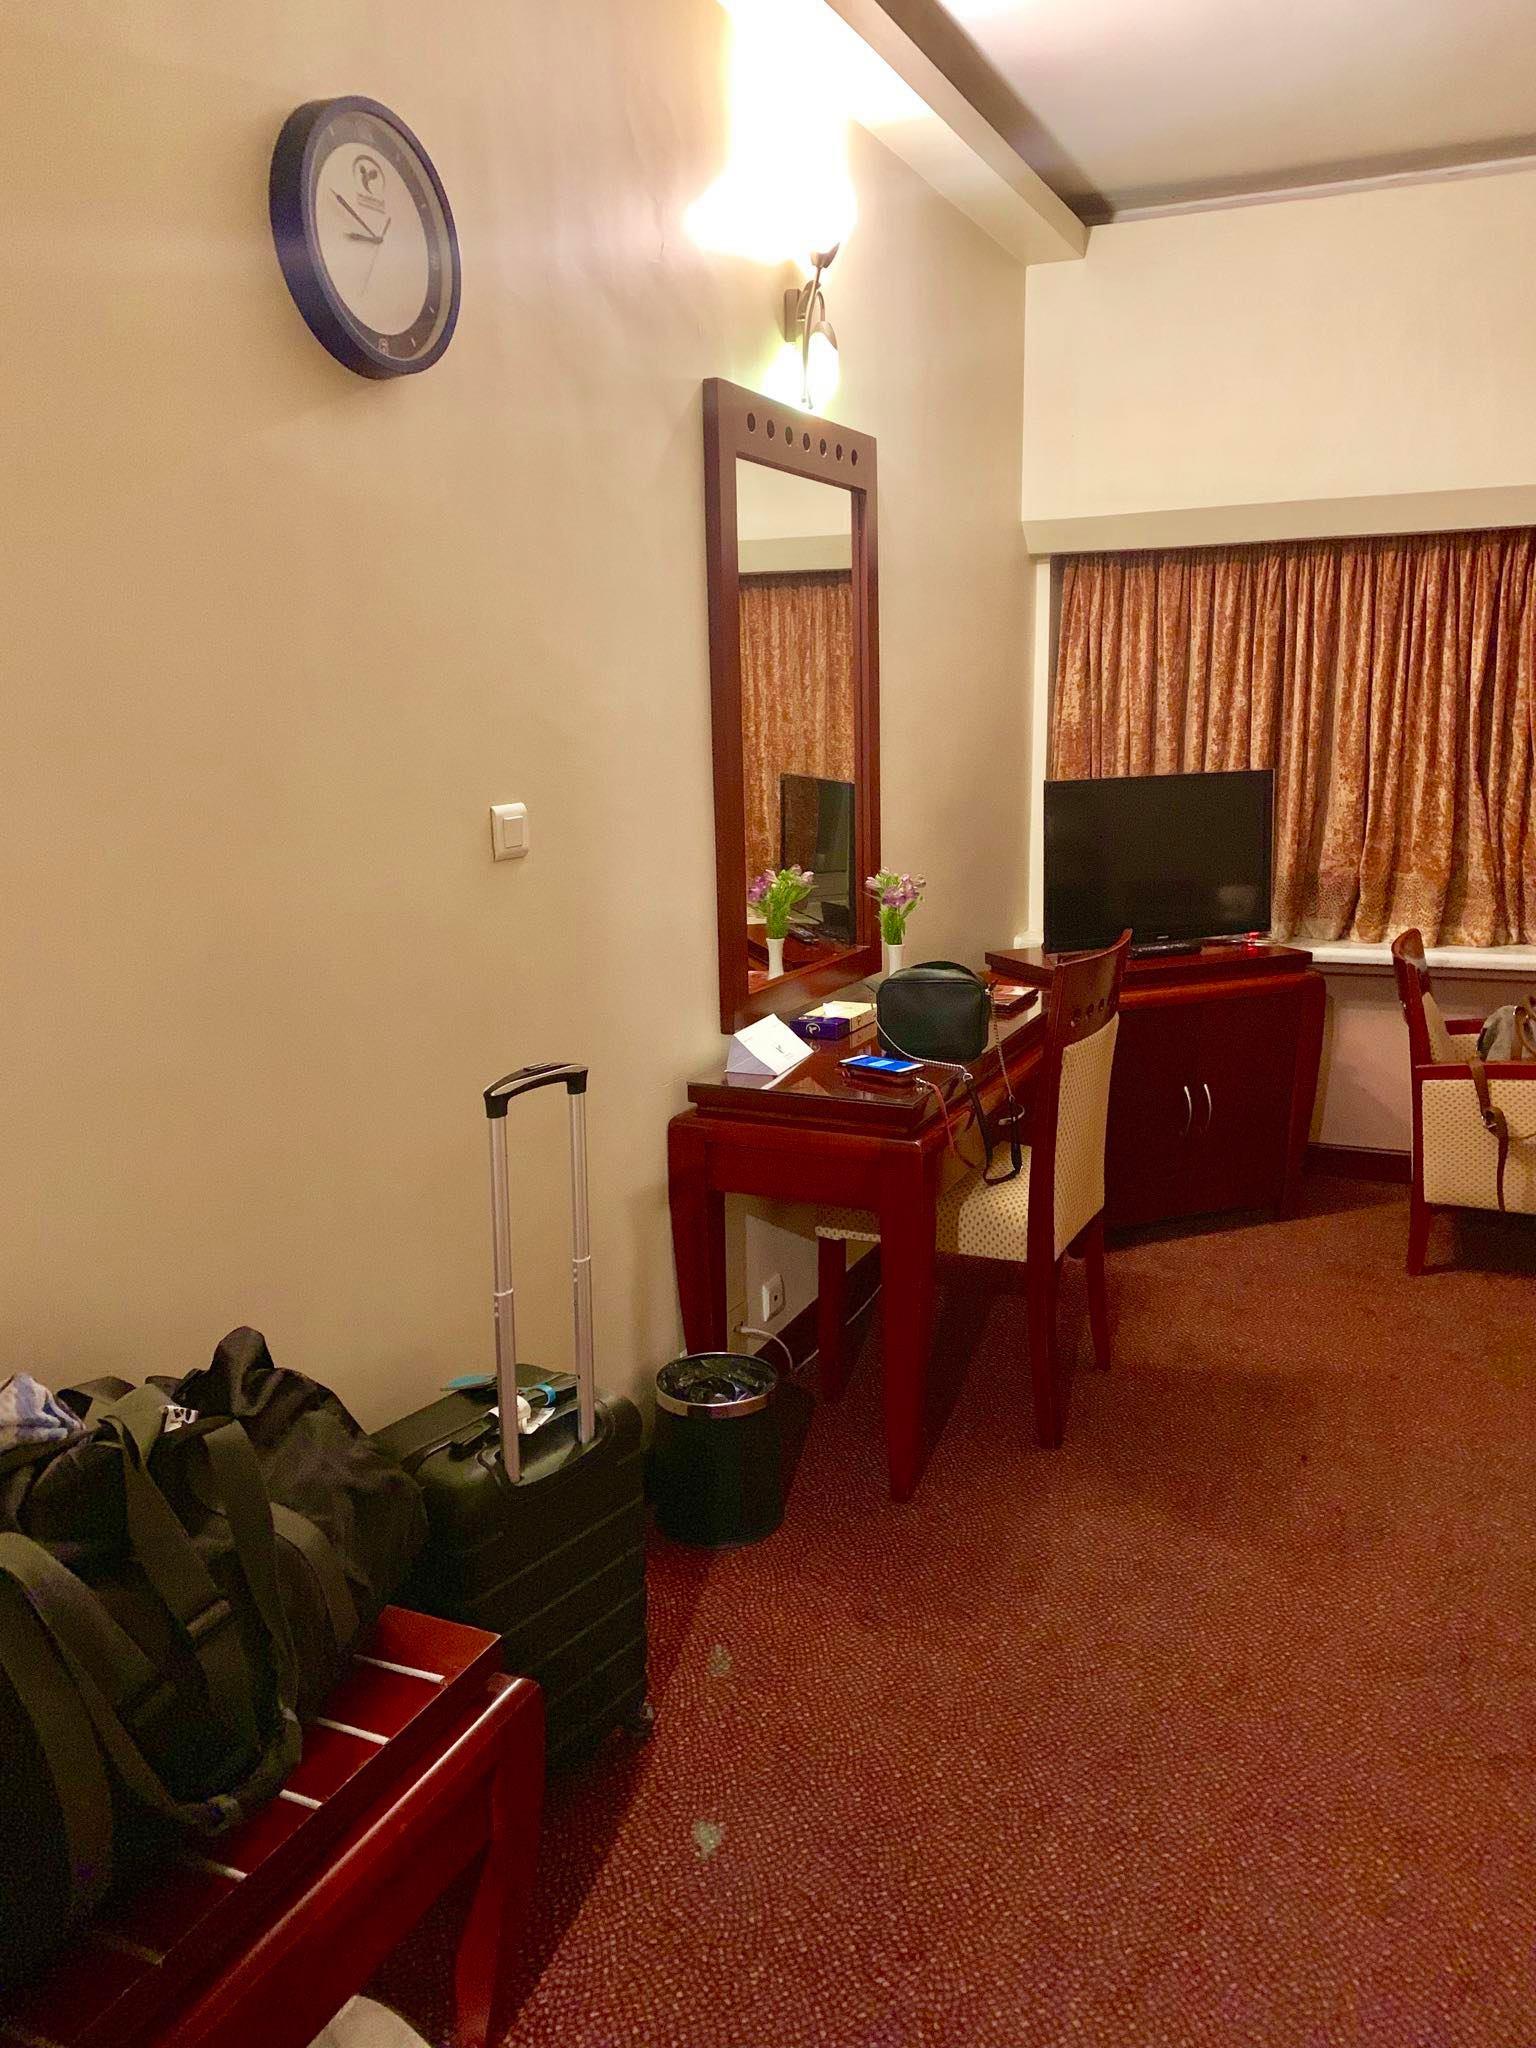 Kach Solo Travels in 2019 Mashhad to Shiraz16.jpg